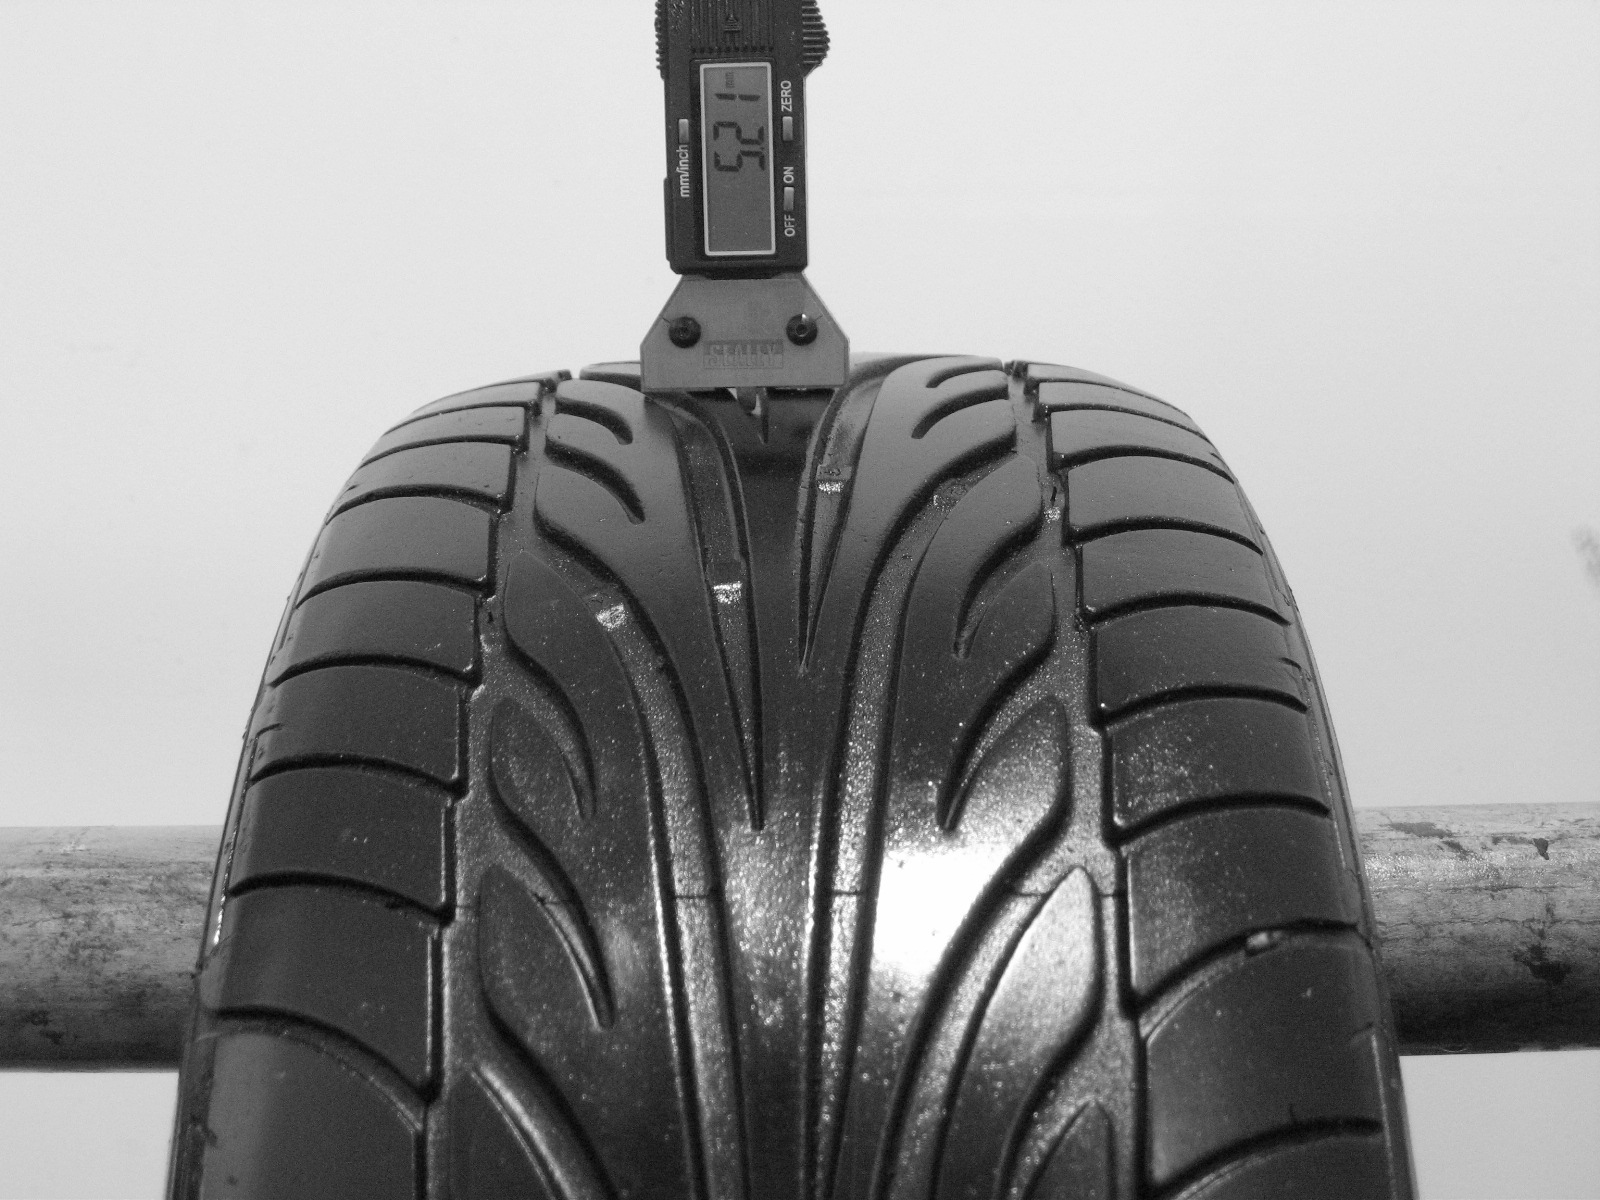 Použité-Pneu-Bazar - 205/55 R15 DUNLOP SP SPORT 9000 -kusovka-rezerva 3mm